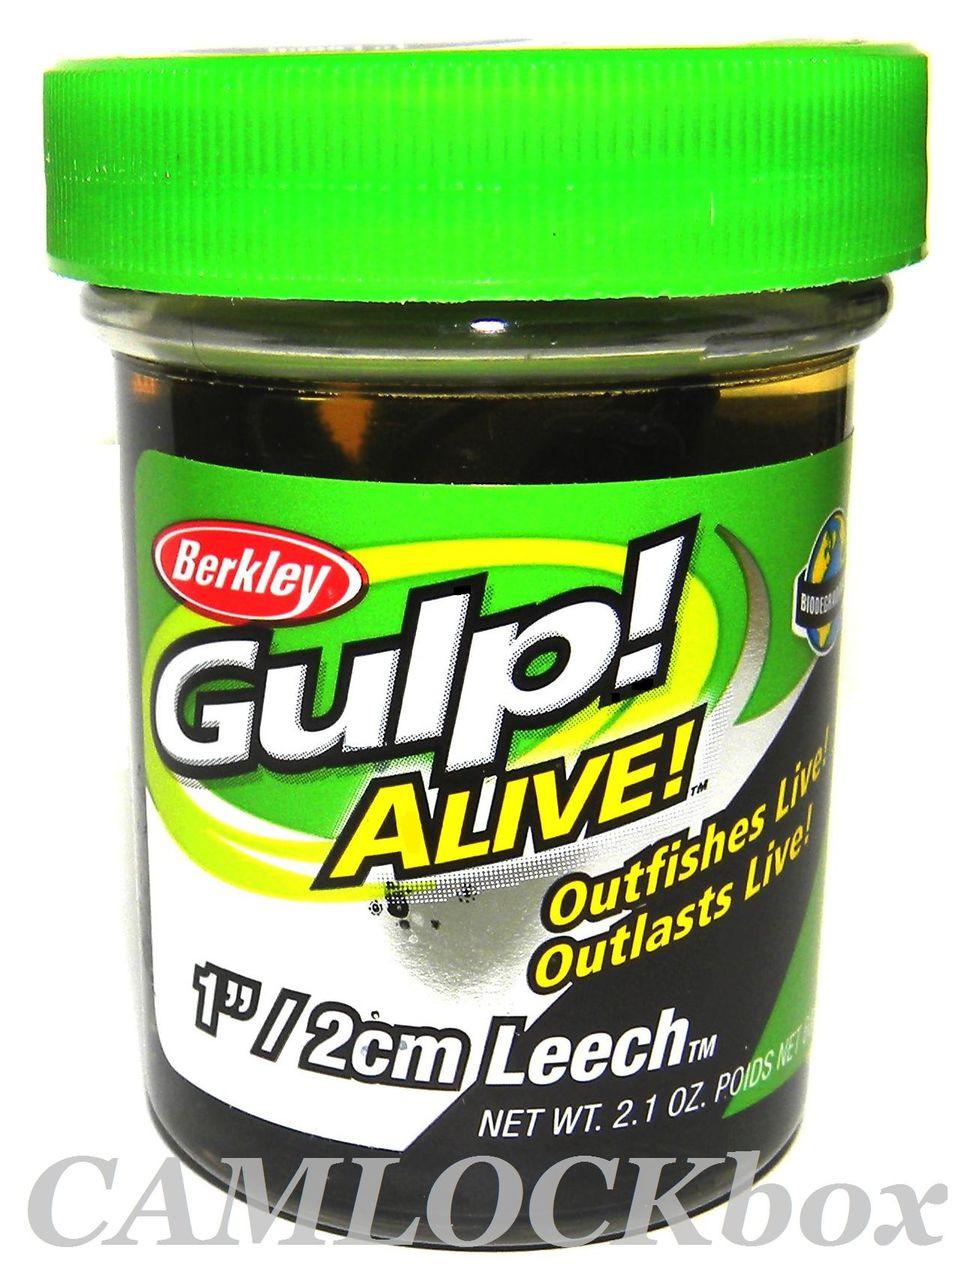 Berkley Gulp! Alive!® 1